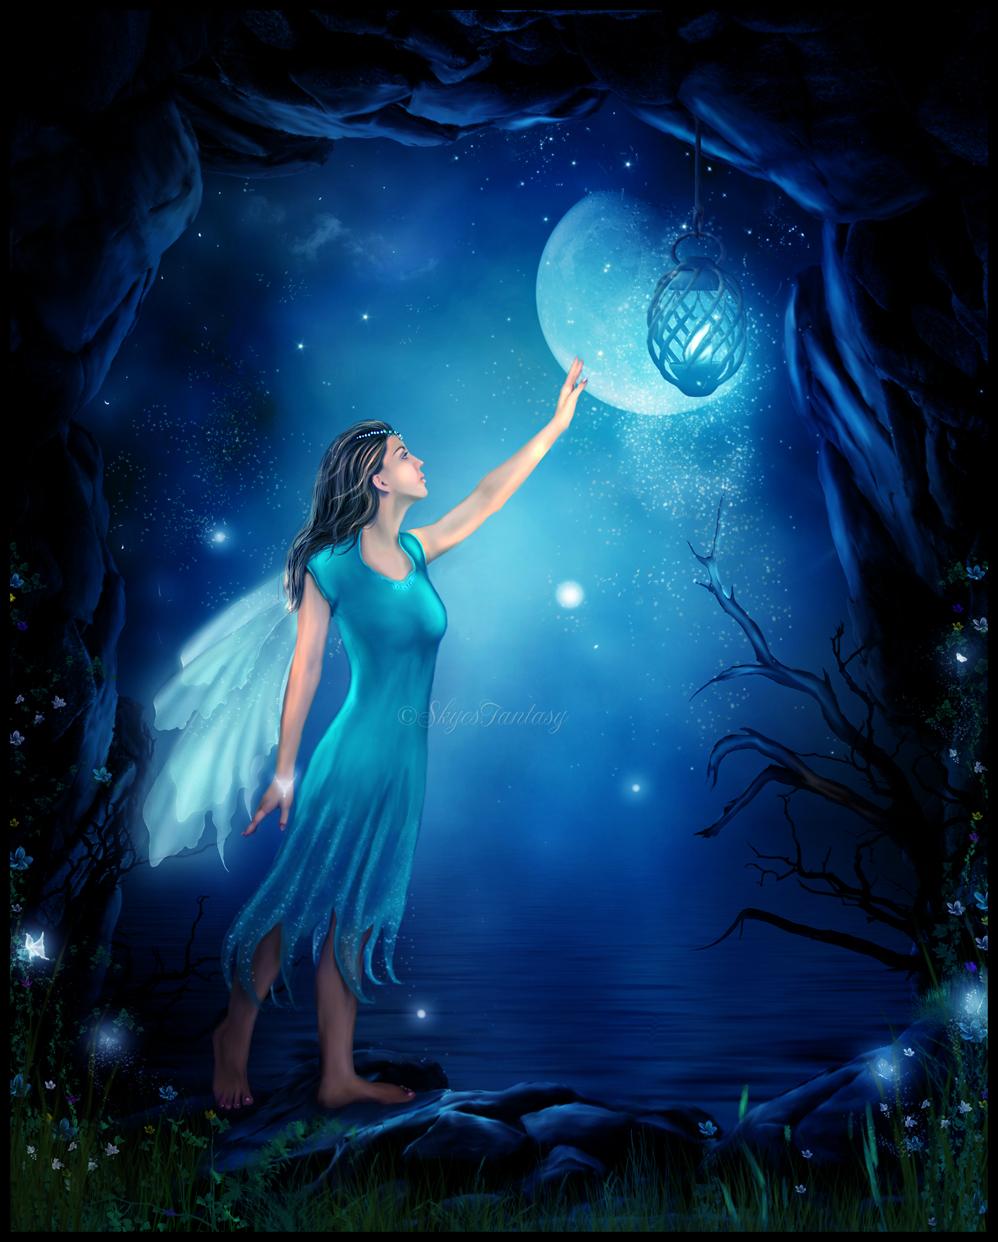 light fairies wallpaper - photo #30